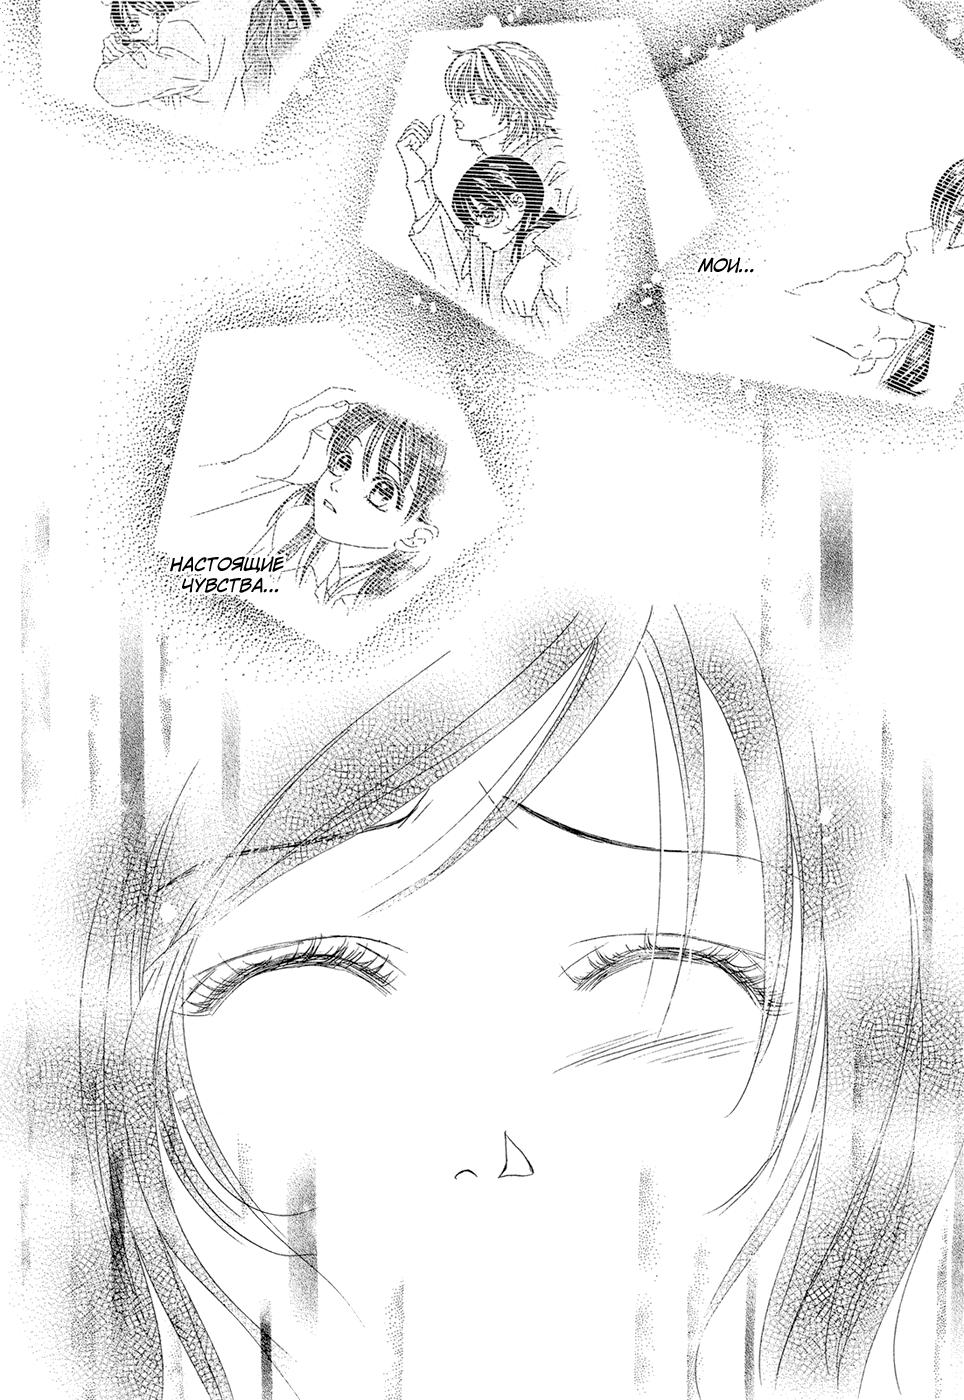 https://r1.ninemanga.com/comics/pic2/61/20989/193364/1427462796353.jpg Page 4